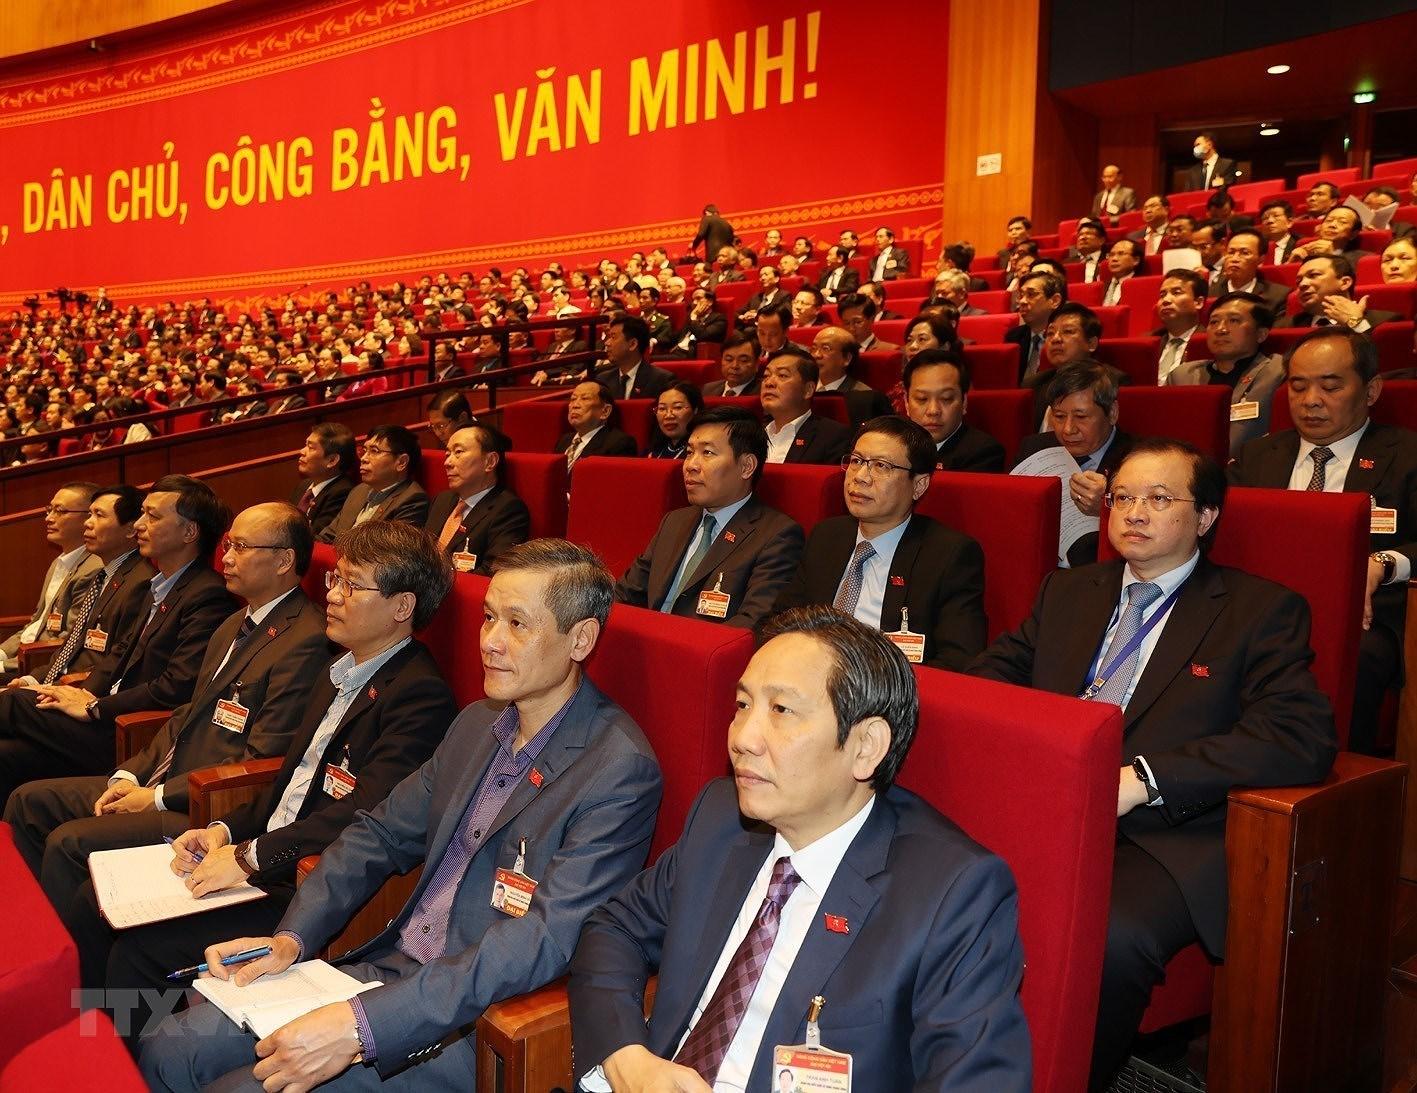 [Photo] Quang canh phien thao luan cac van kien Dai hoi XIII cua Dang hinh anh 5